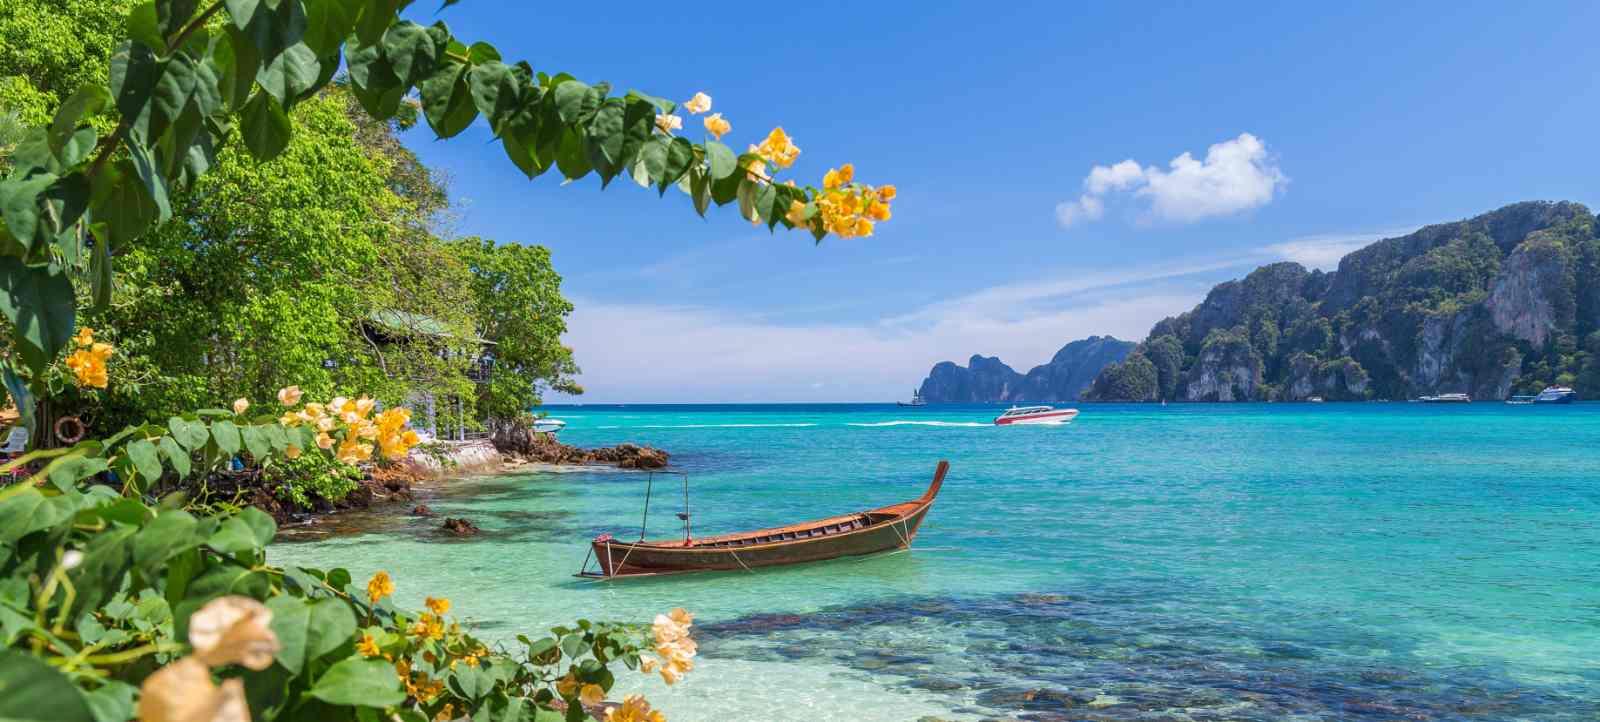 Thailand halal travel